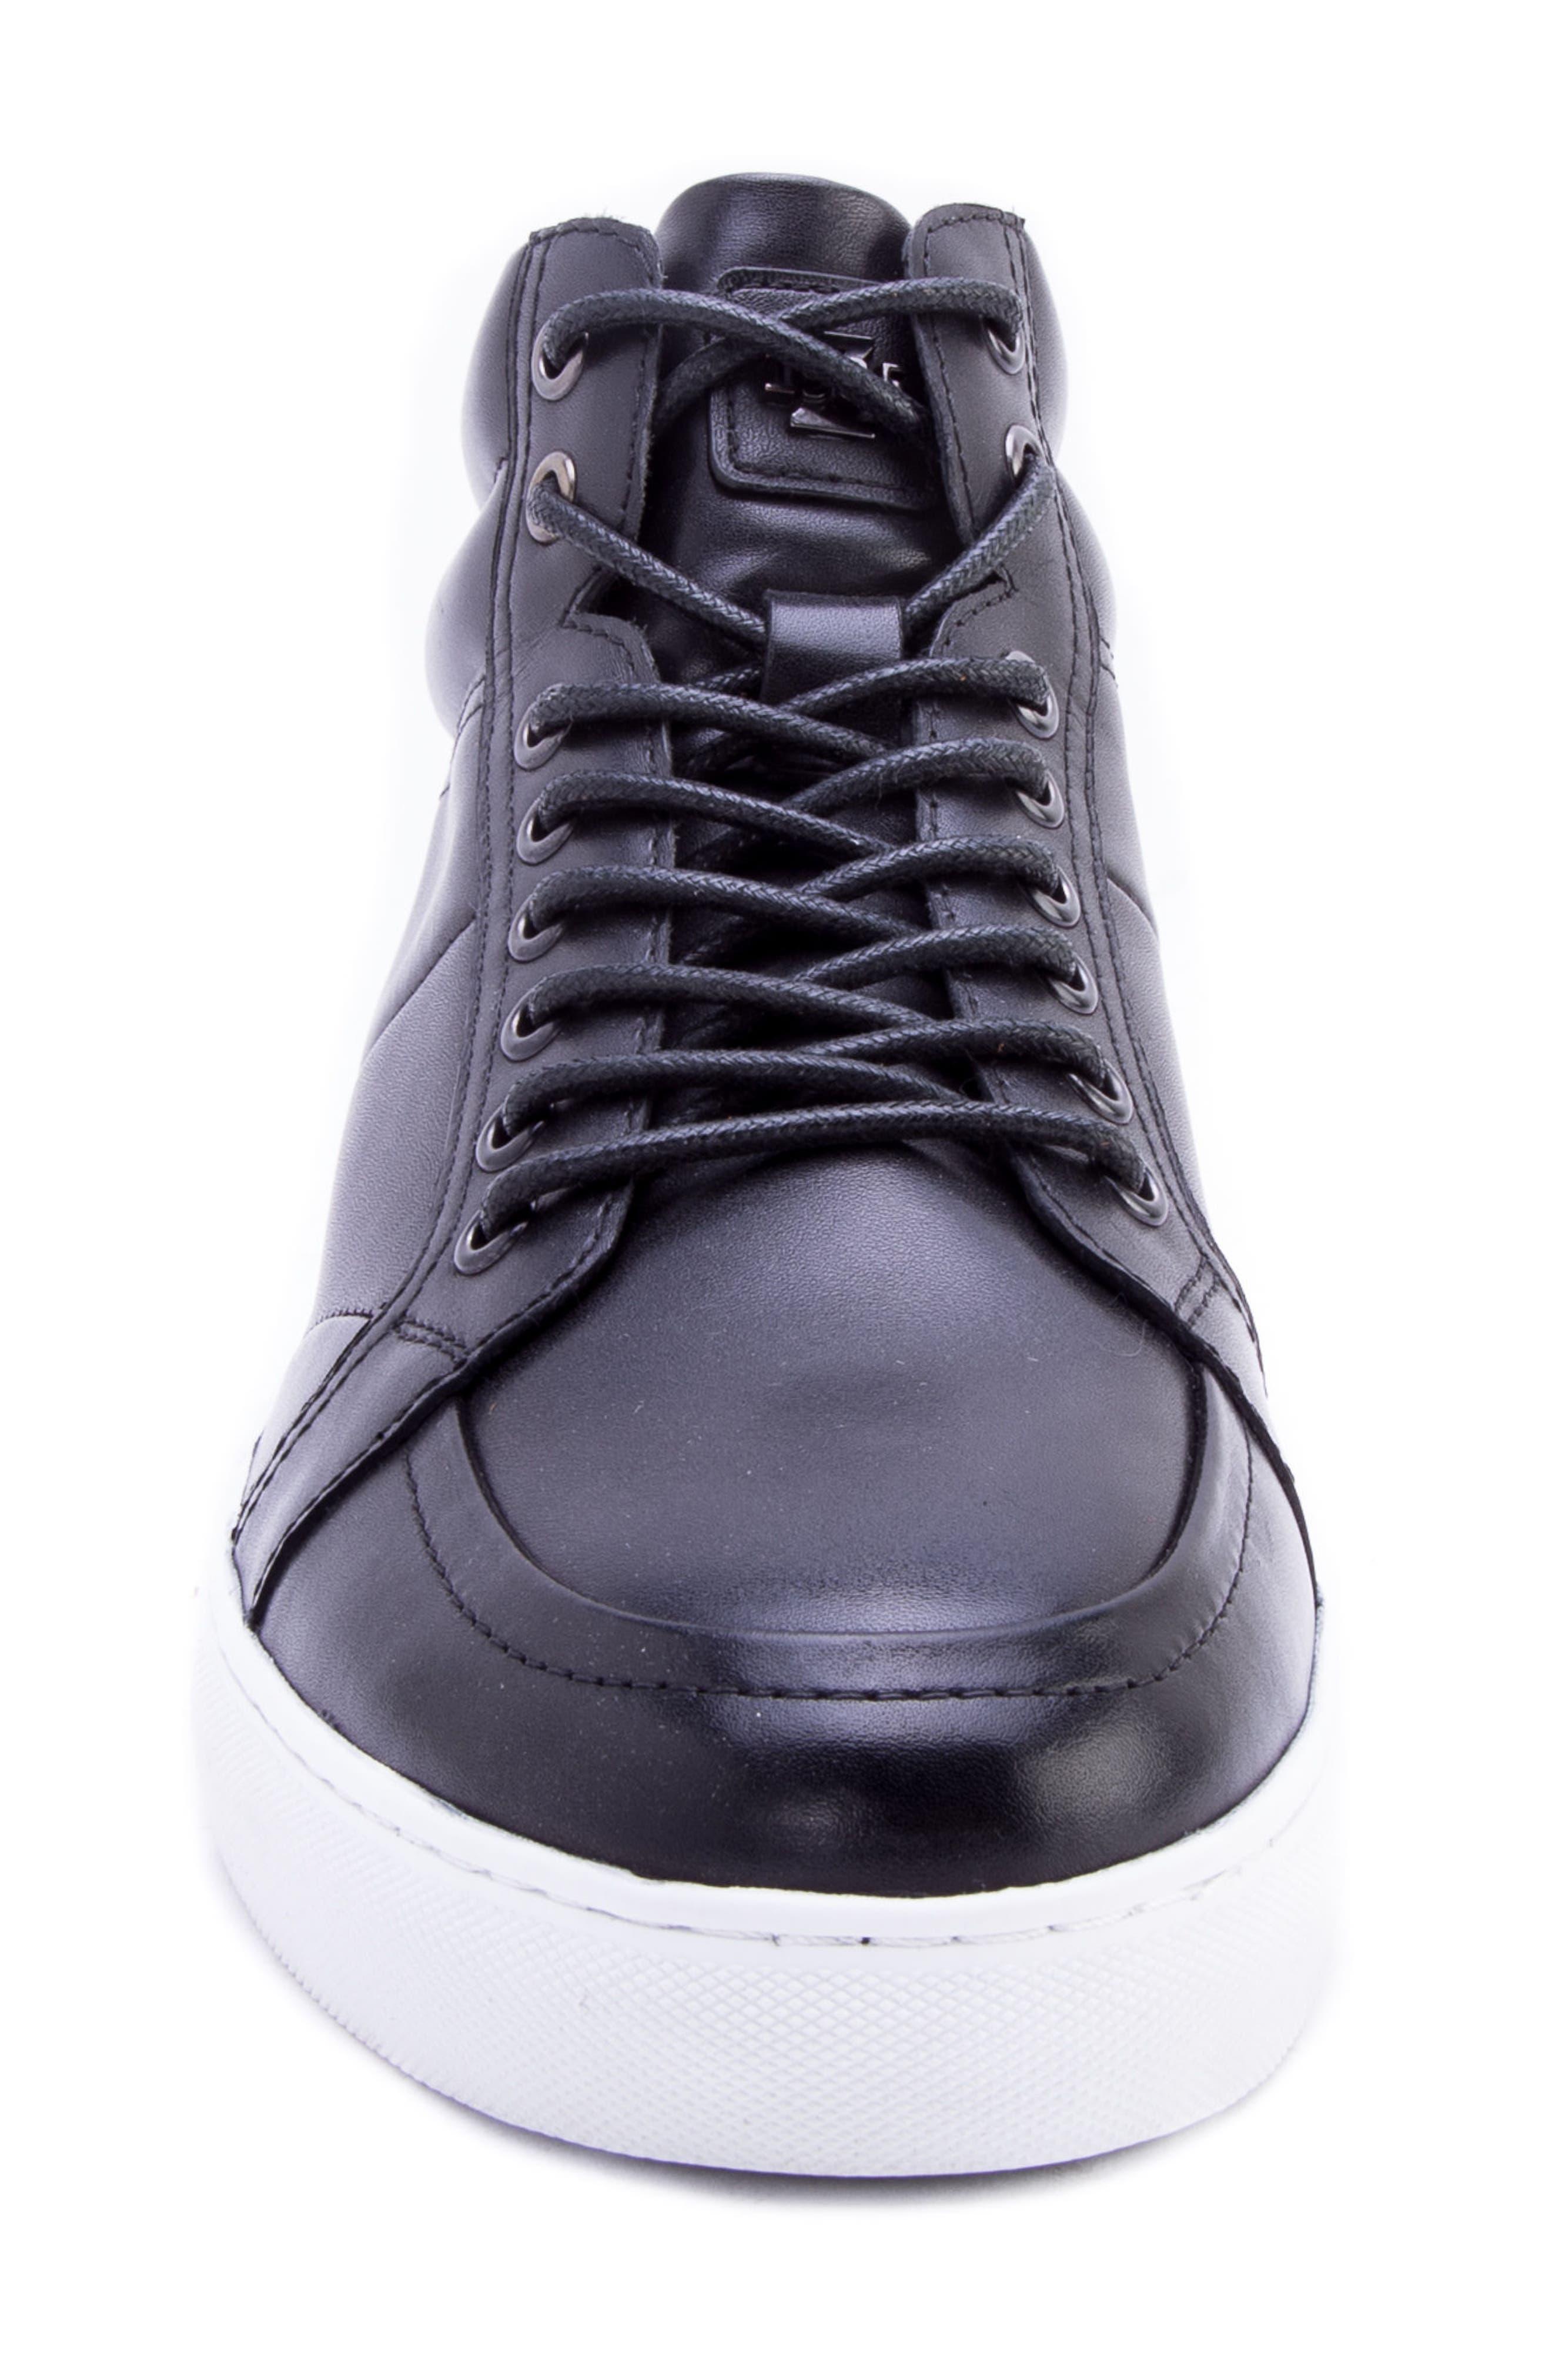 Tassel Mid Top Sneaker,                             Alternate thumbnail 4, color,                             BLACK LEATHER